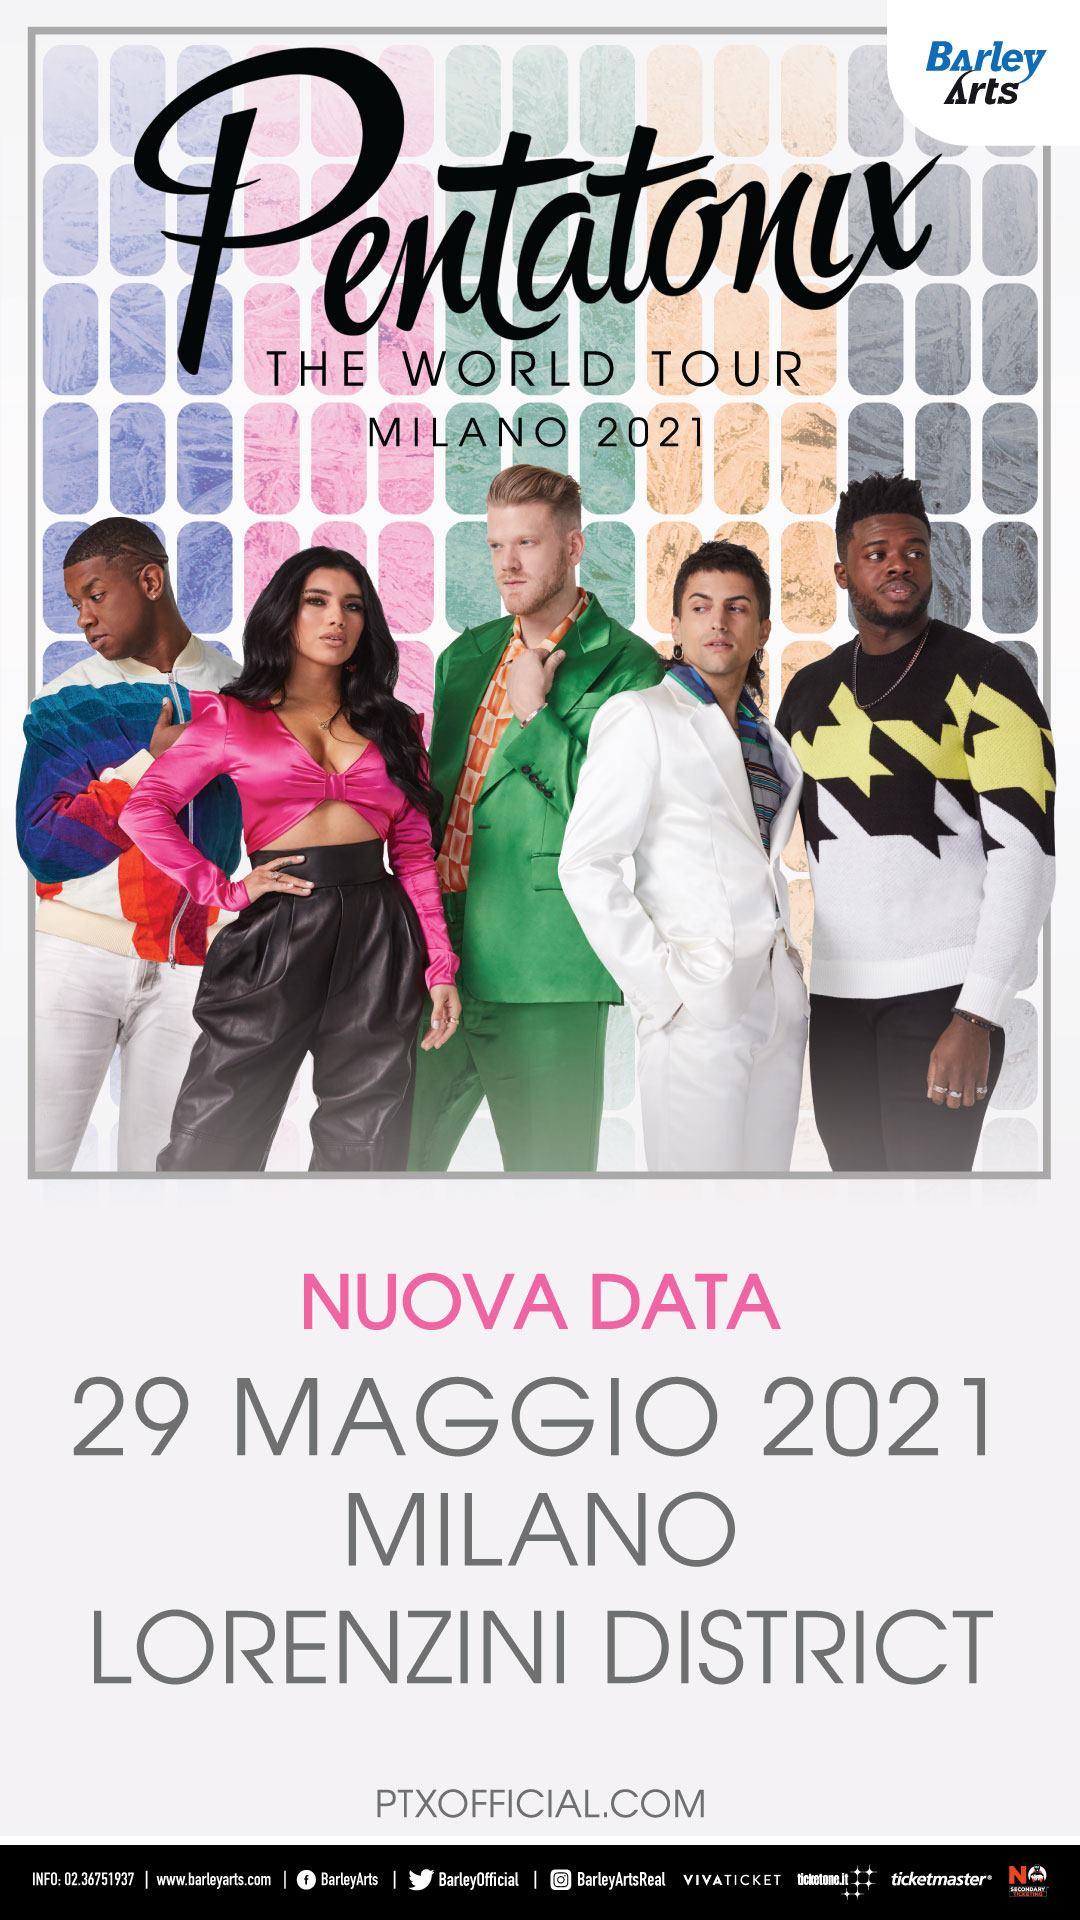 Pentatonix: The World Tour, Lorenzini District Milano